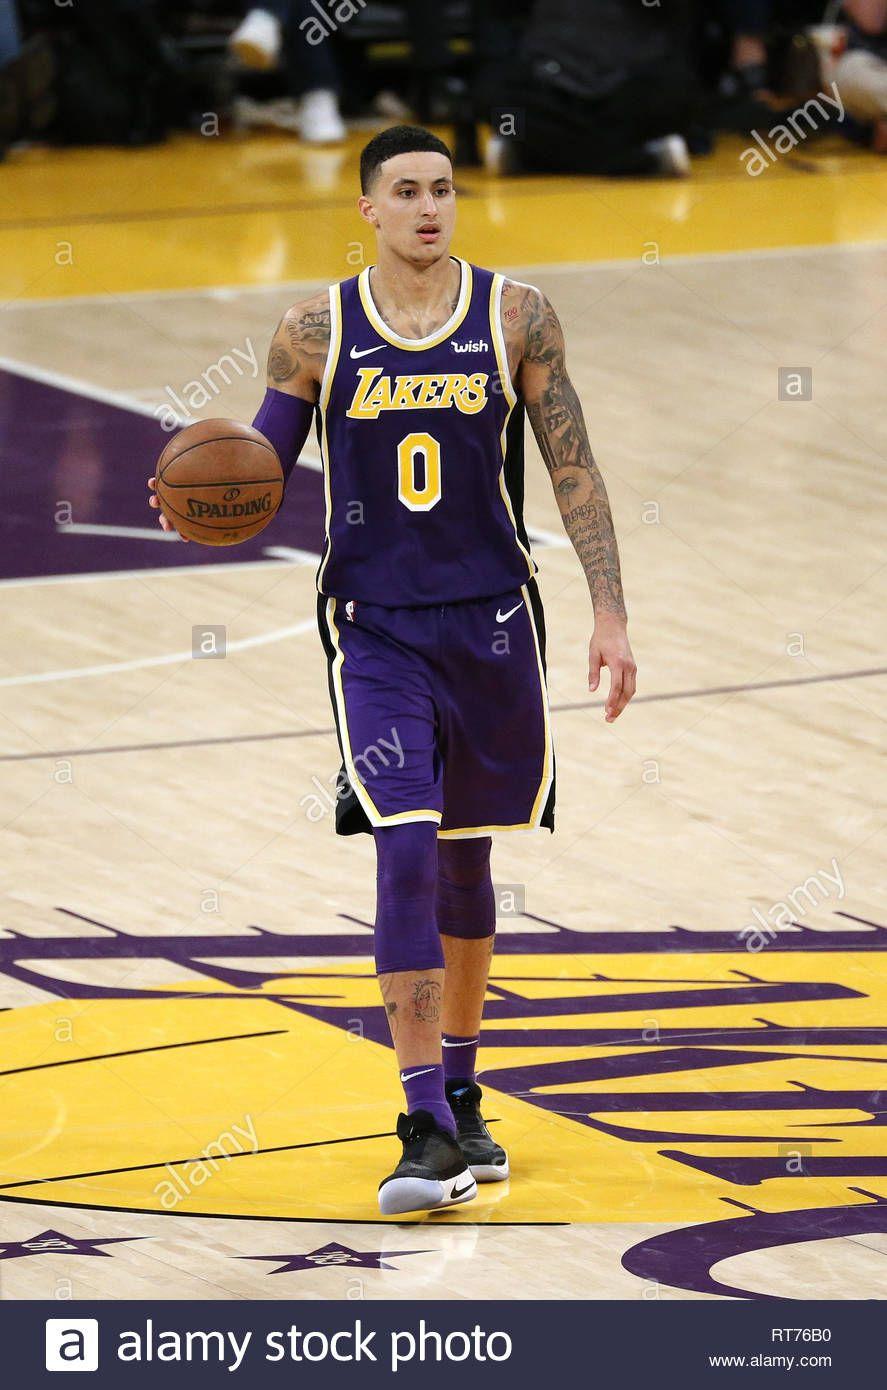 Download This Stock Image February 27 2019 Los Angeles California U S Los Angeles Lakersa Kyle Kuzma In 2020 Kyle Kuzma Los Angeles Lakers Nba Basketball Game